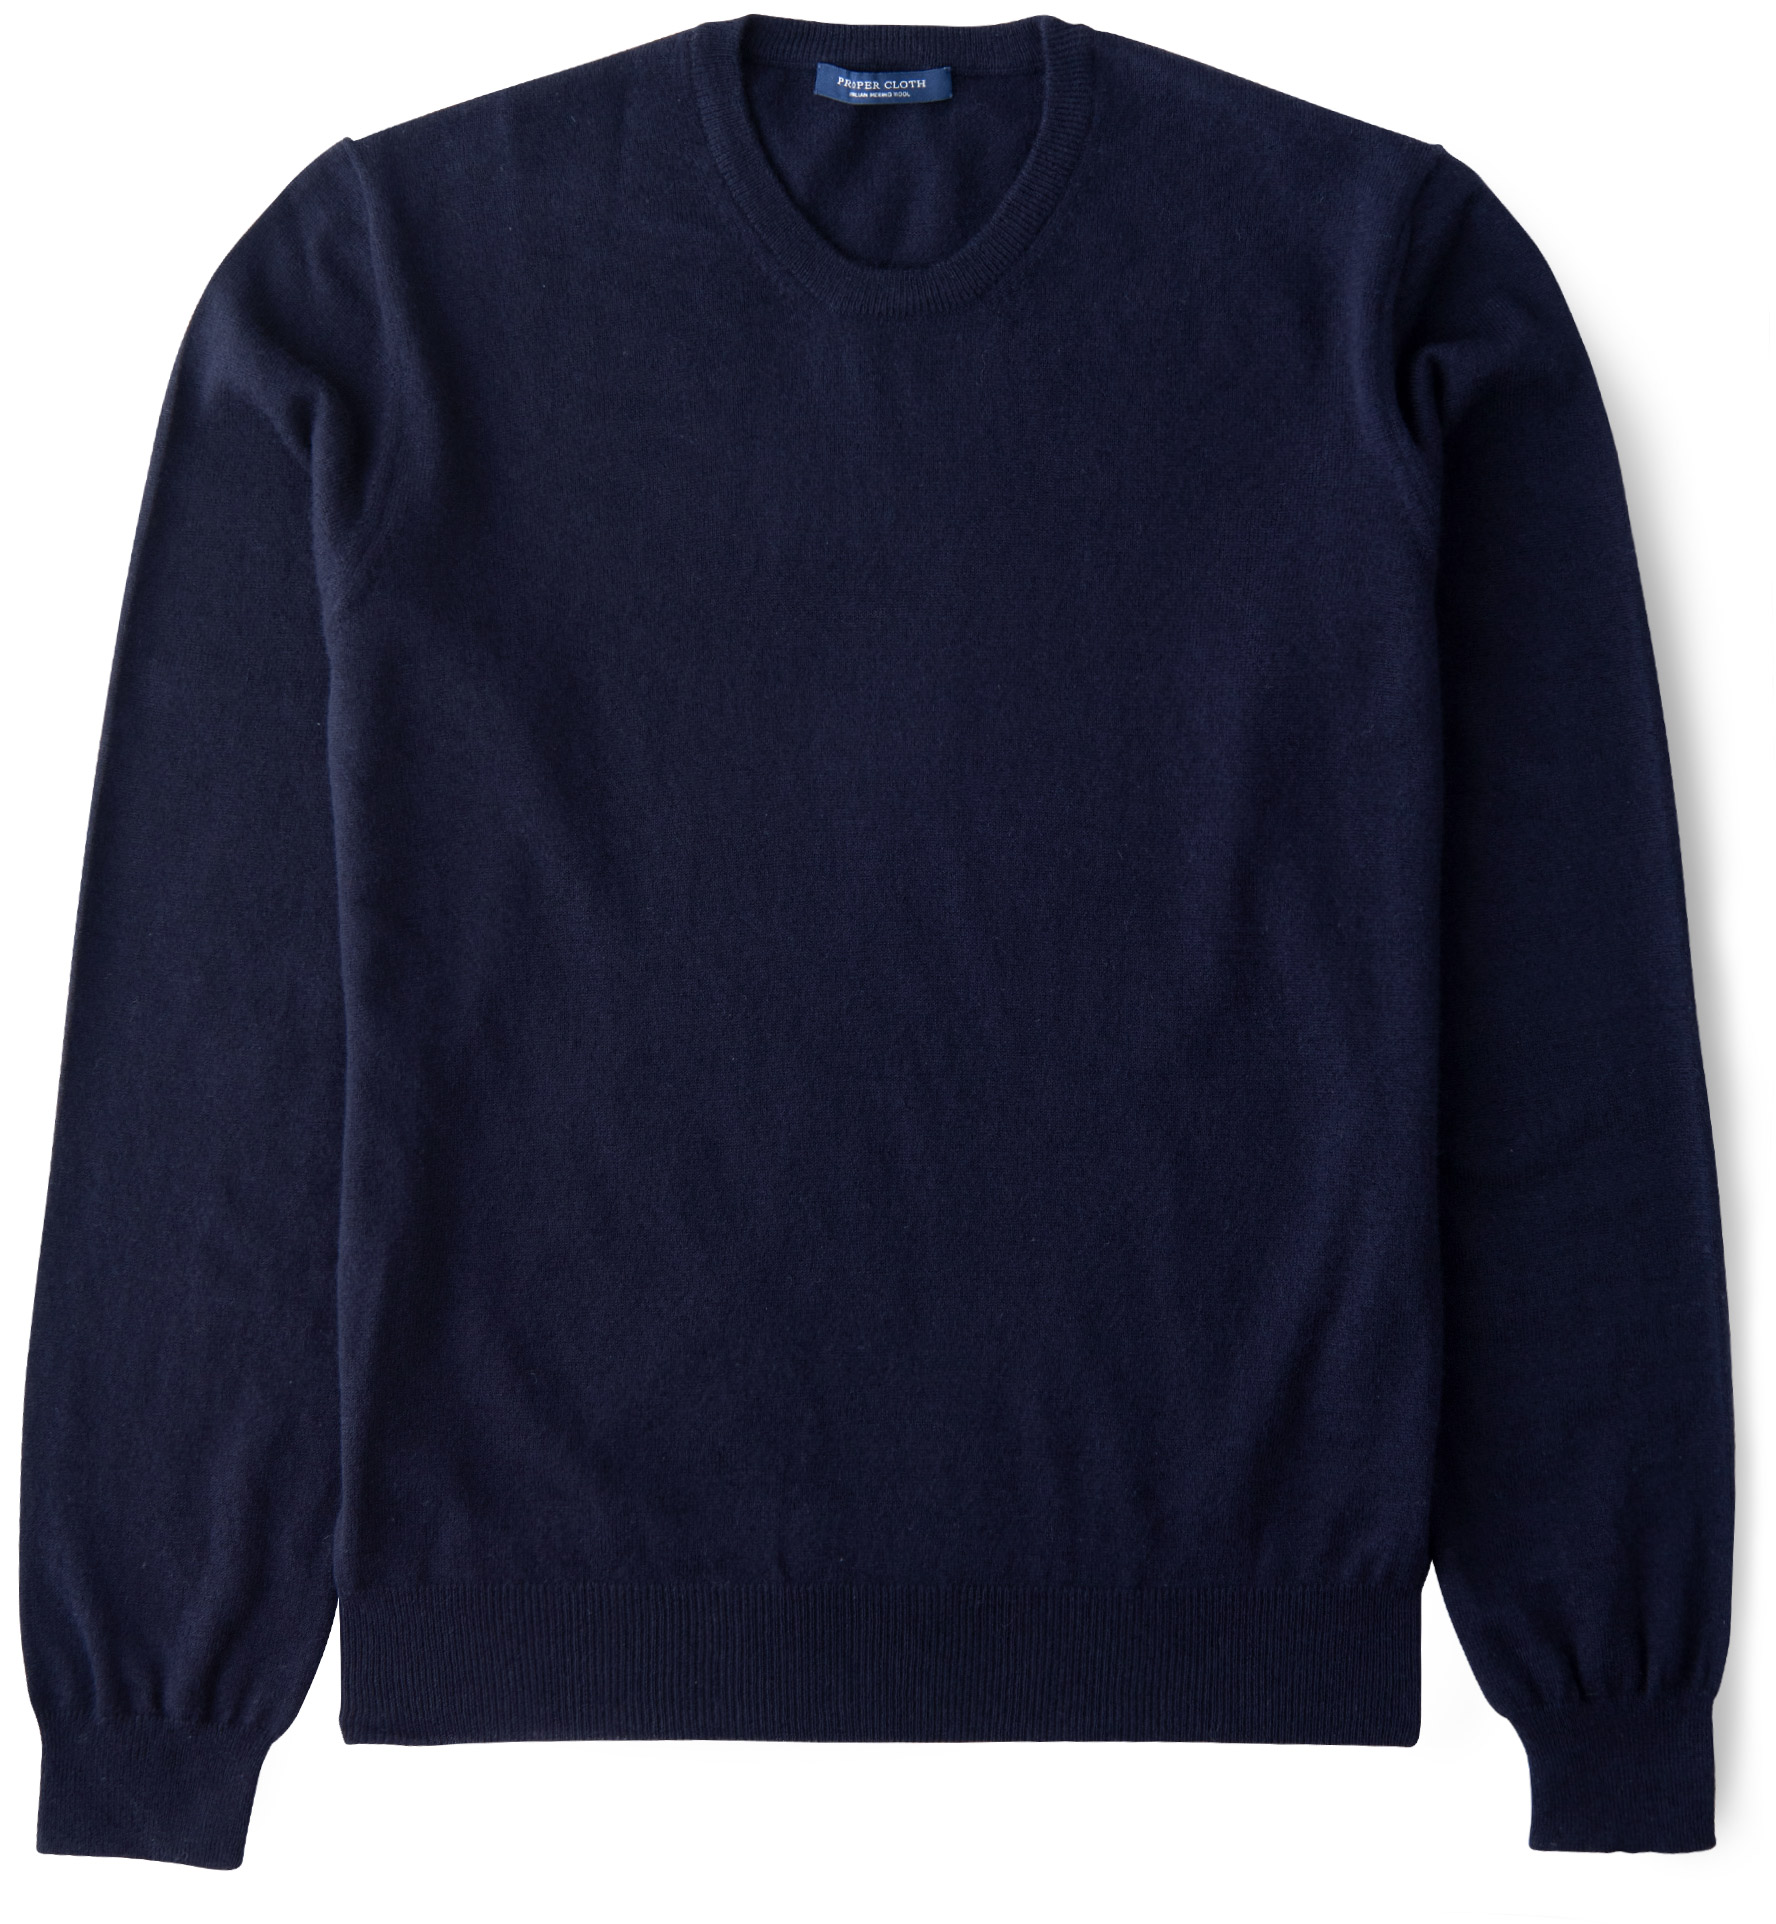 Zoom Image of Navy Merino Crewneck Sweater